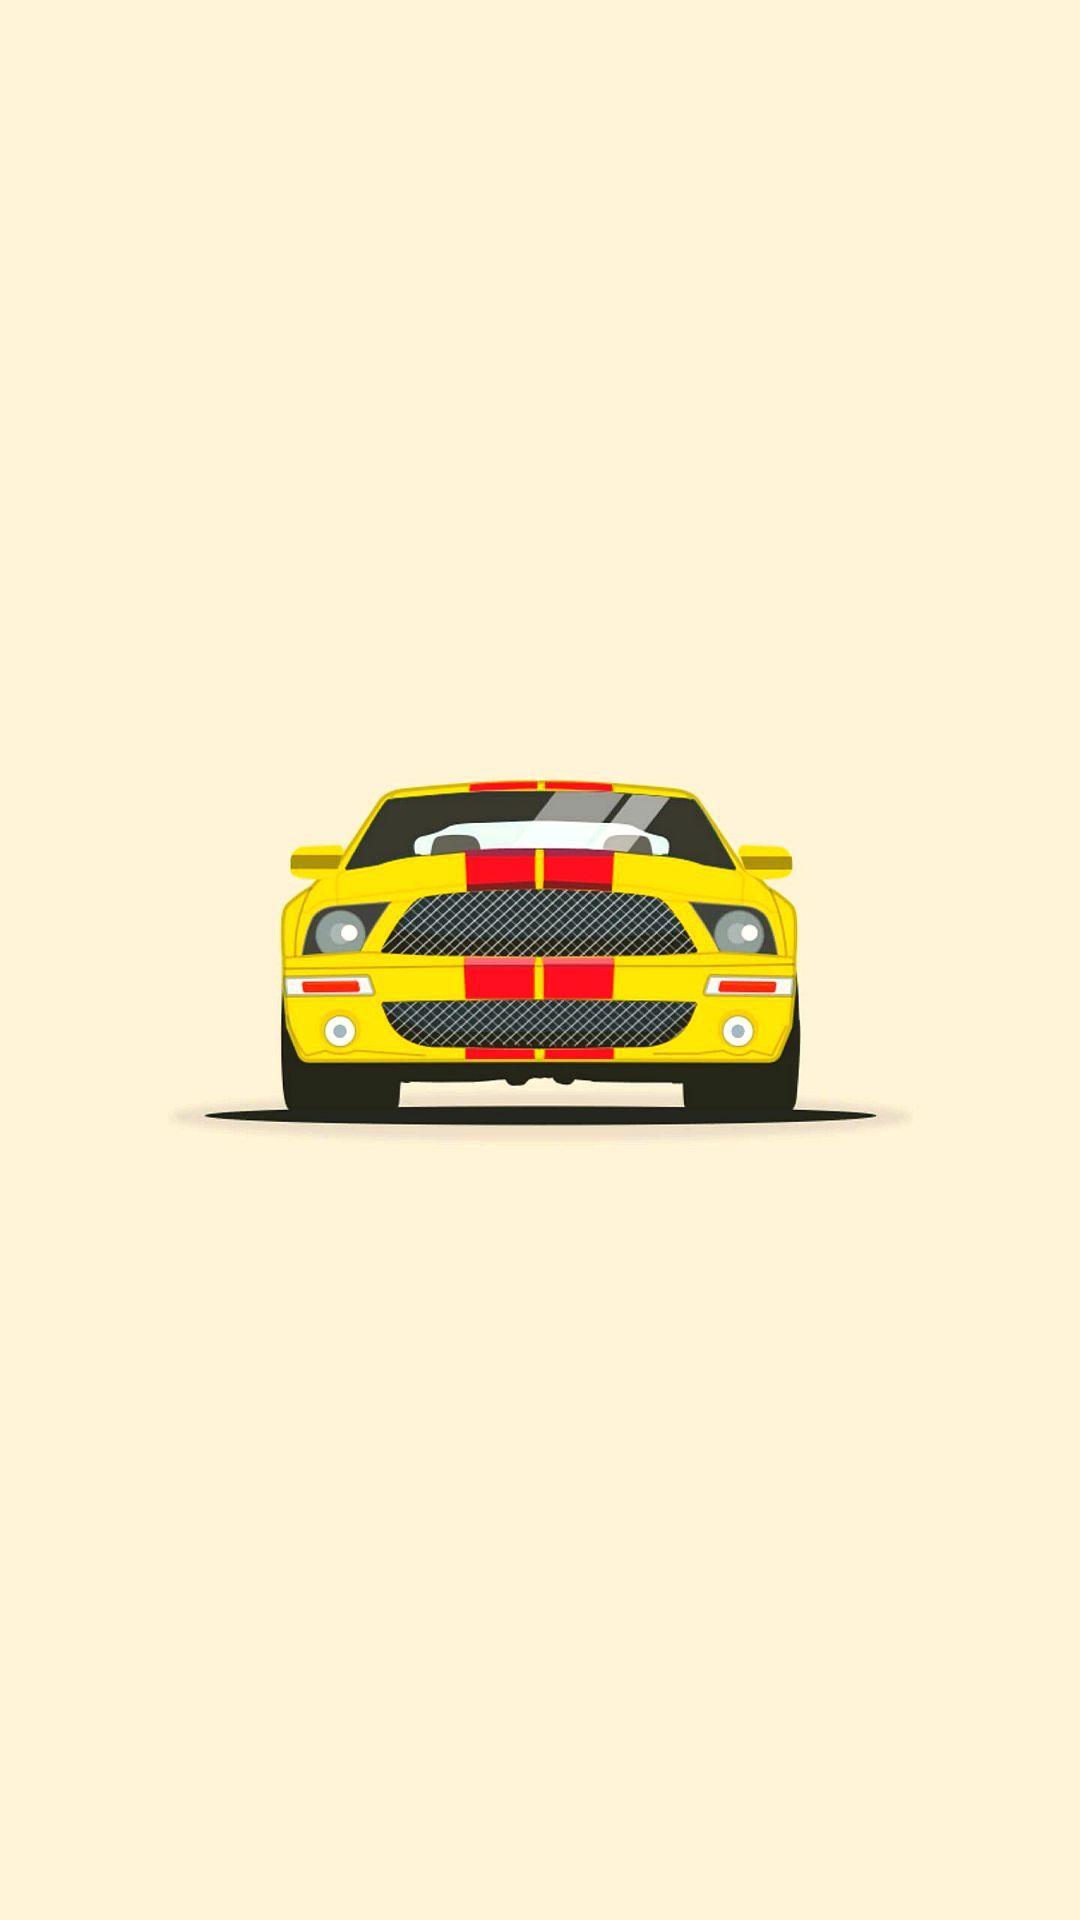 Mustang Minimal Wallpaper 1080x1920 Mustang Wallpaper Ford Mustang Wallpaper Hd Wallpaper Iphone